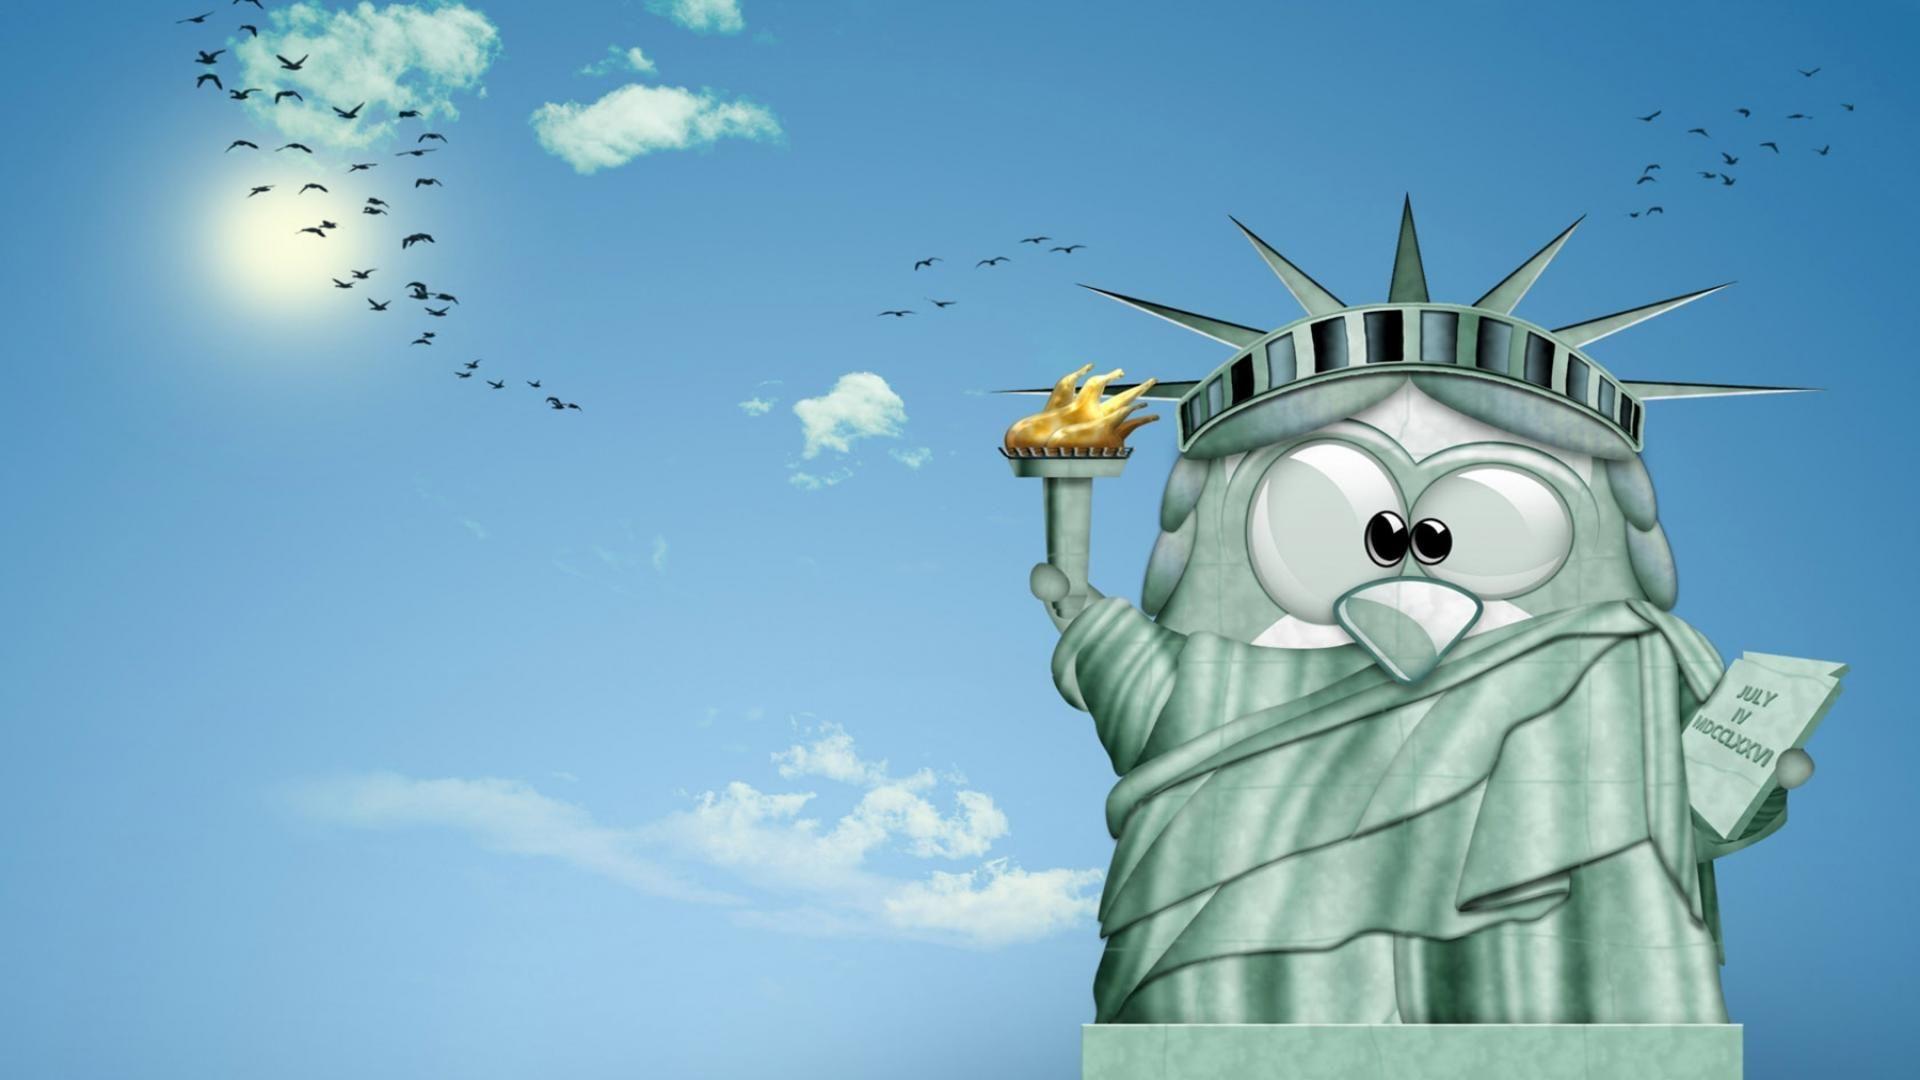 Funny Cartoon Wallpapers 1080p การสอน Pinterest Cartoon